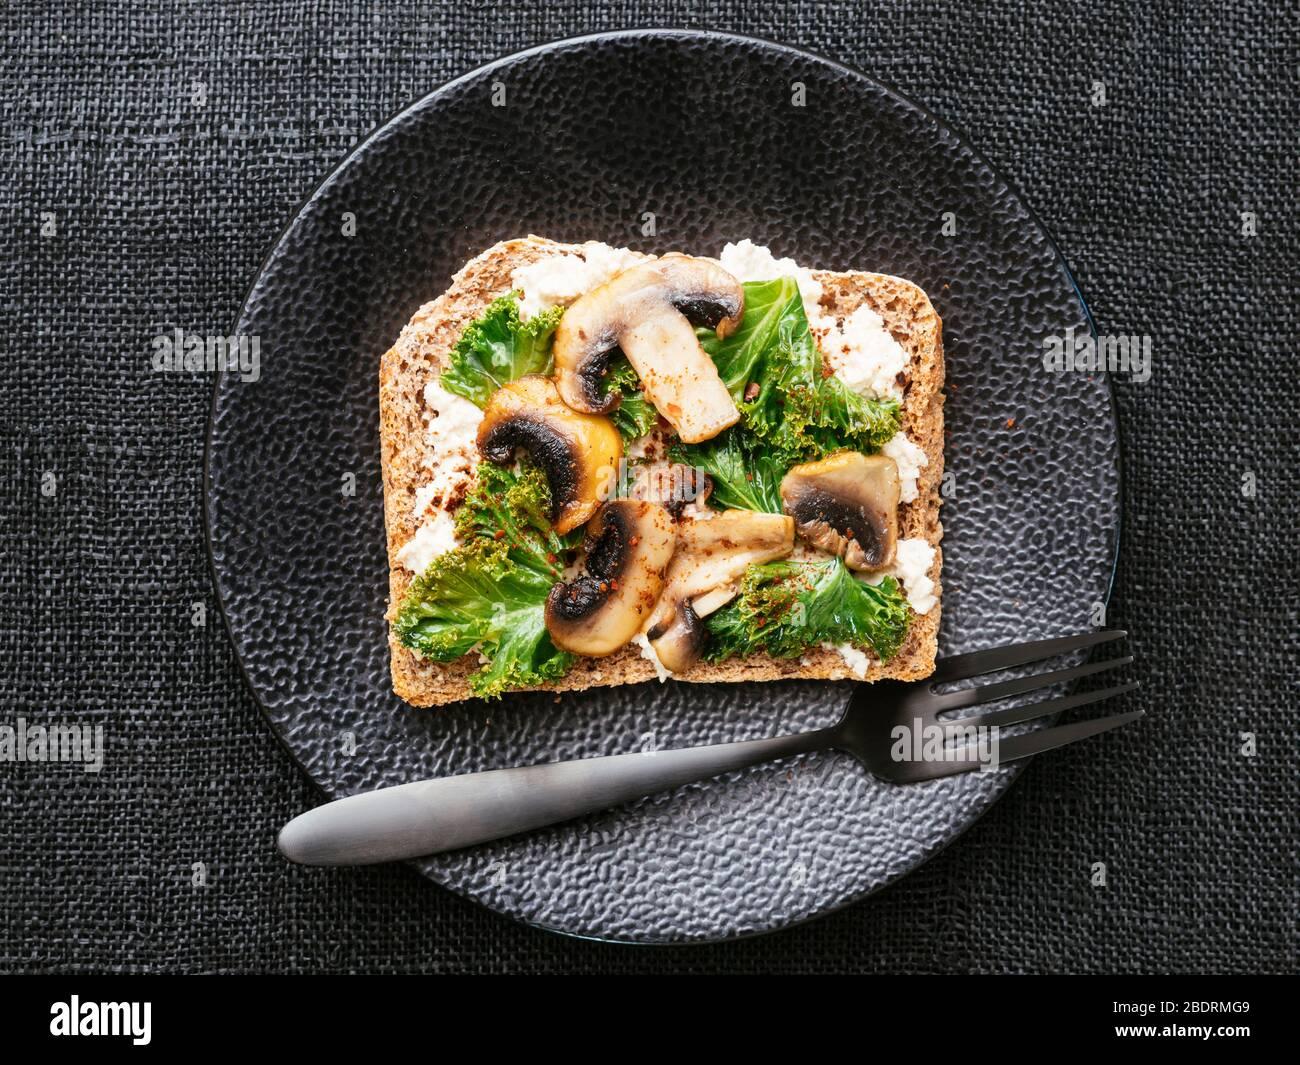 Vegan Ricotta, Mushrooms and Kale on Toast Stock Photo   Alamy